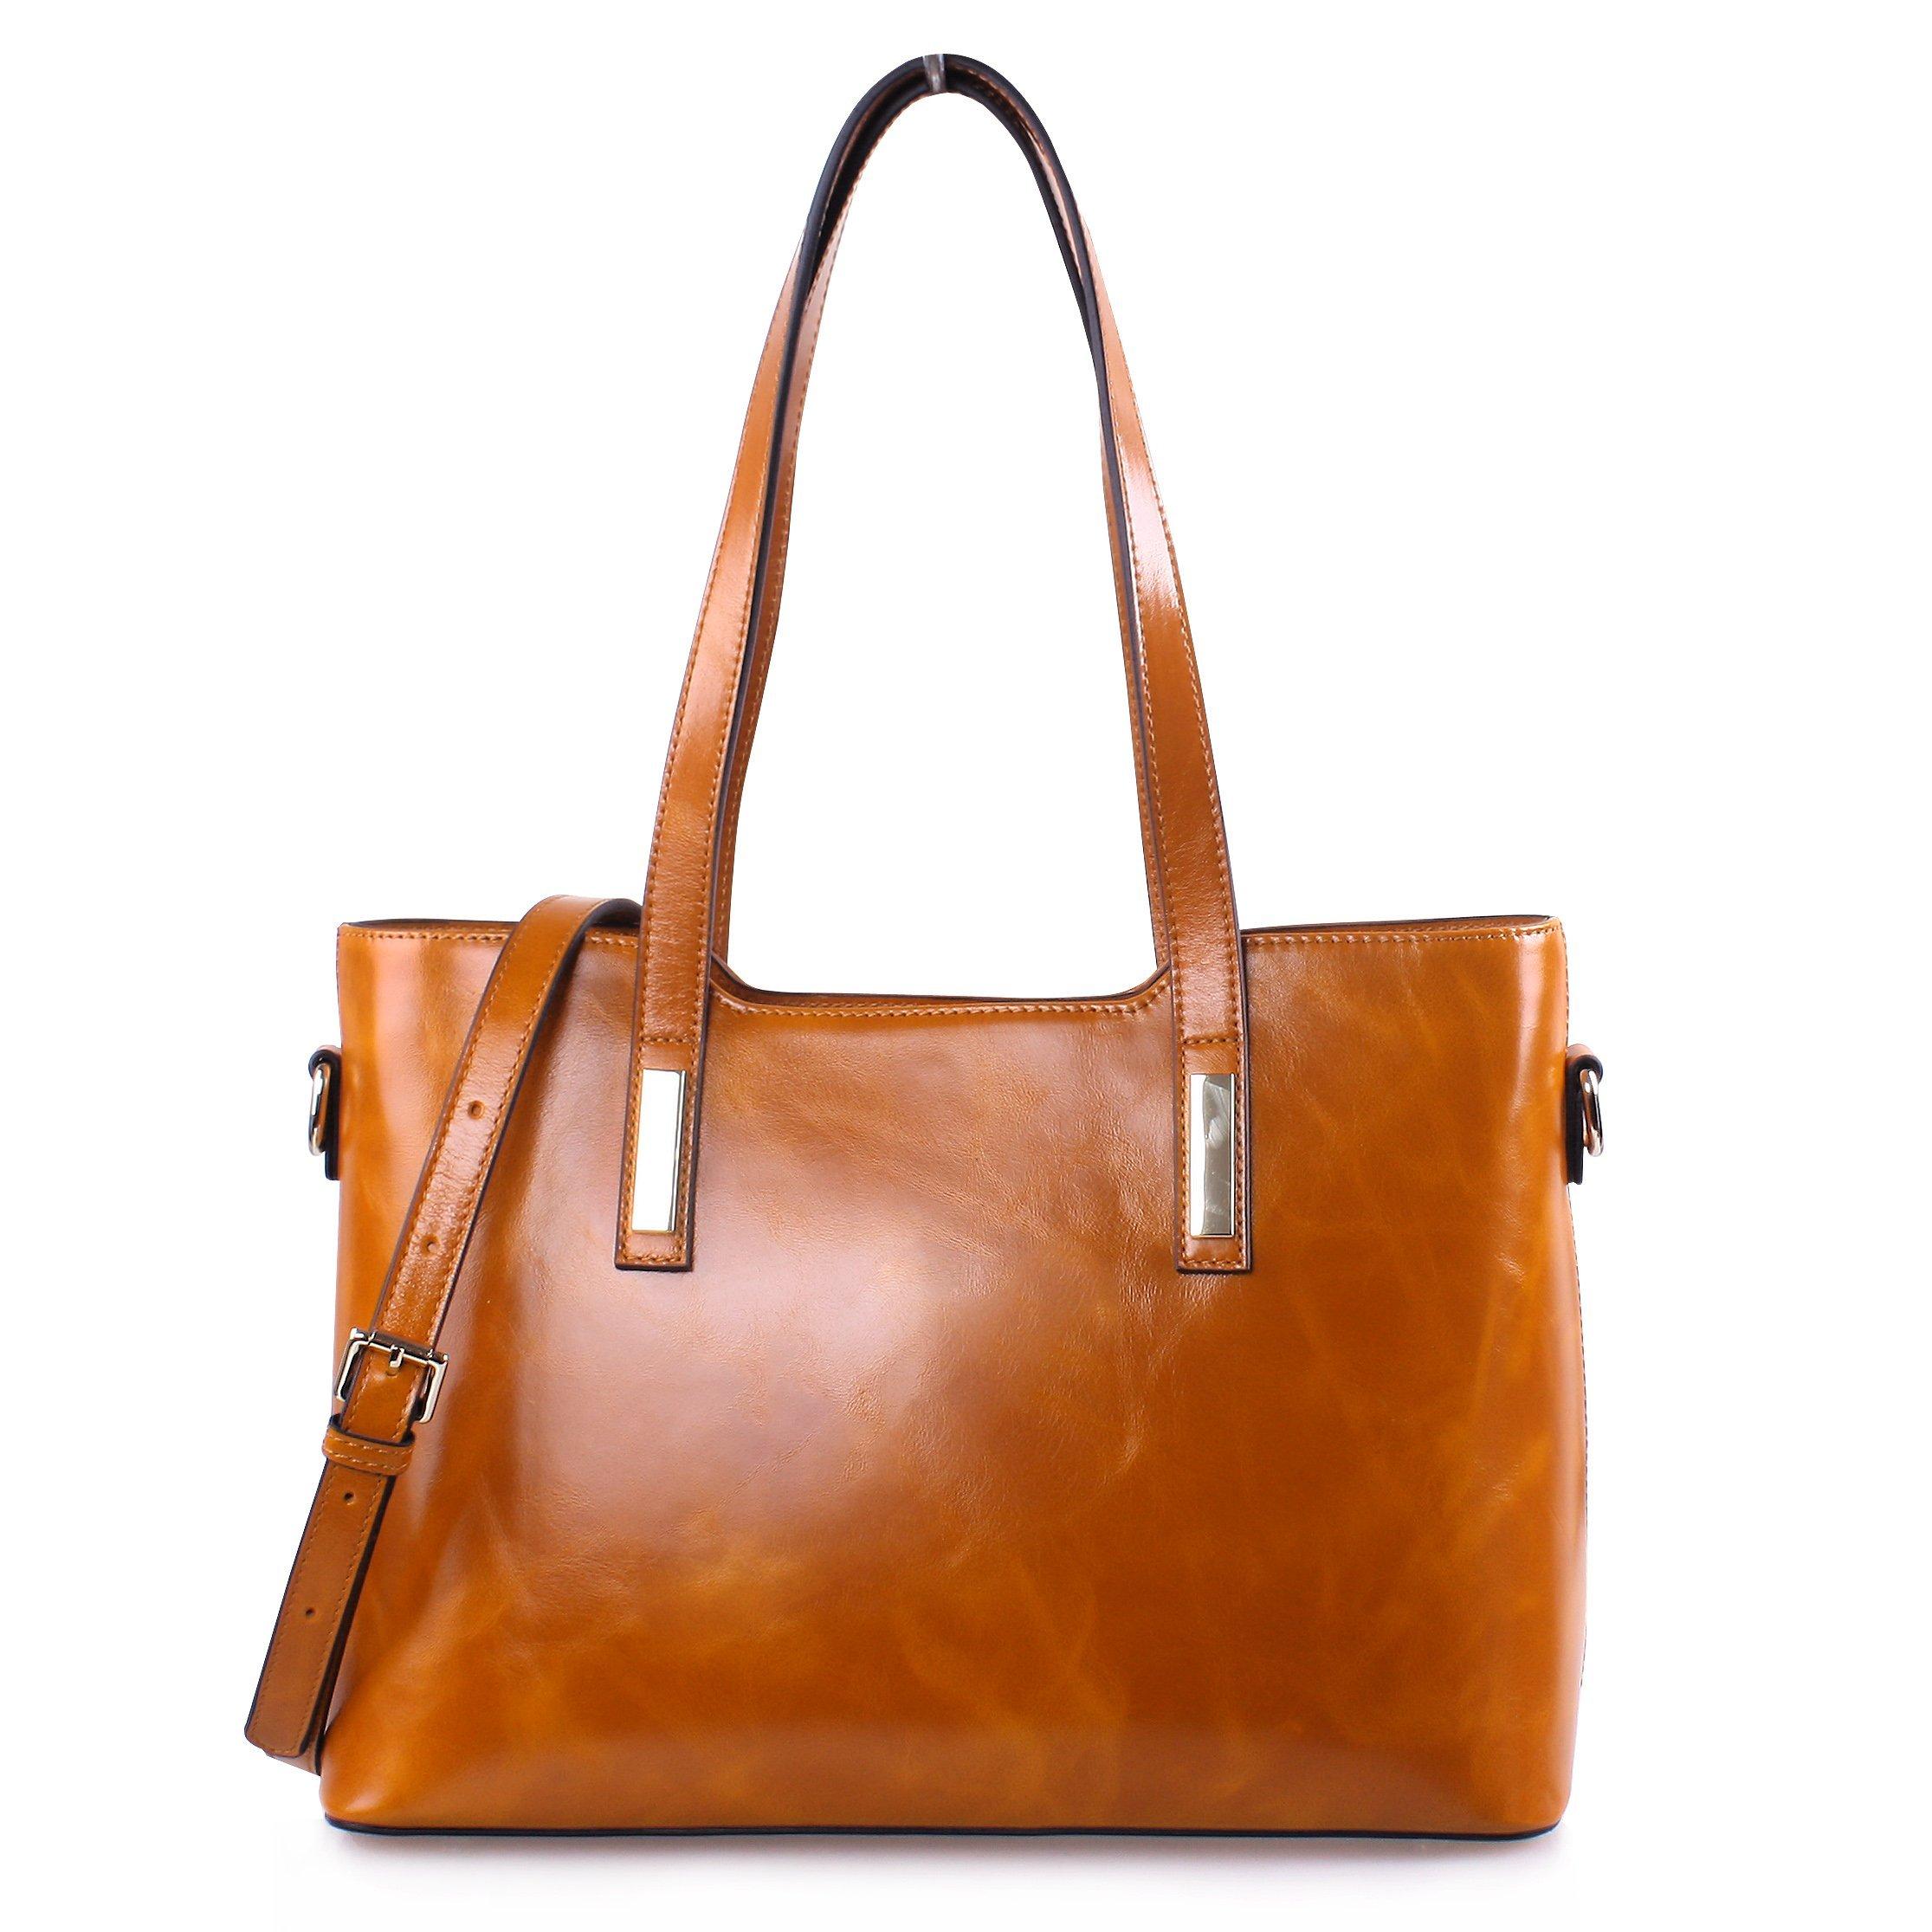 Yafeige Women's Handbags Vintage Genuine Leather Shoulder Bags Tote Cross Body Bags Purse for Ladies(Brown-1)